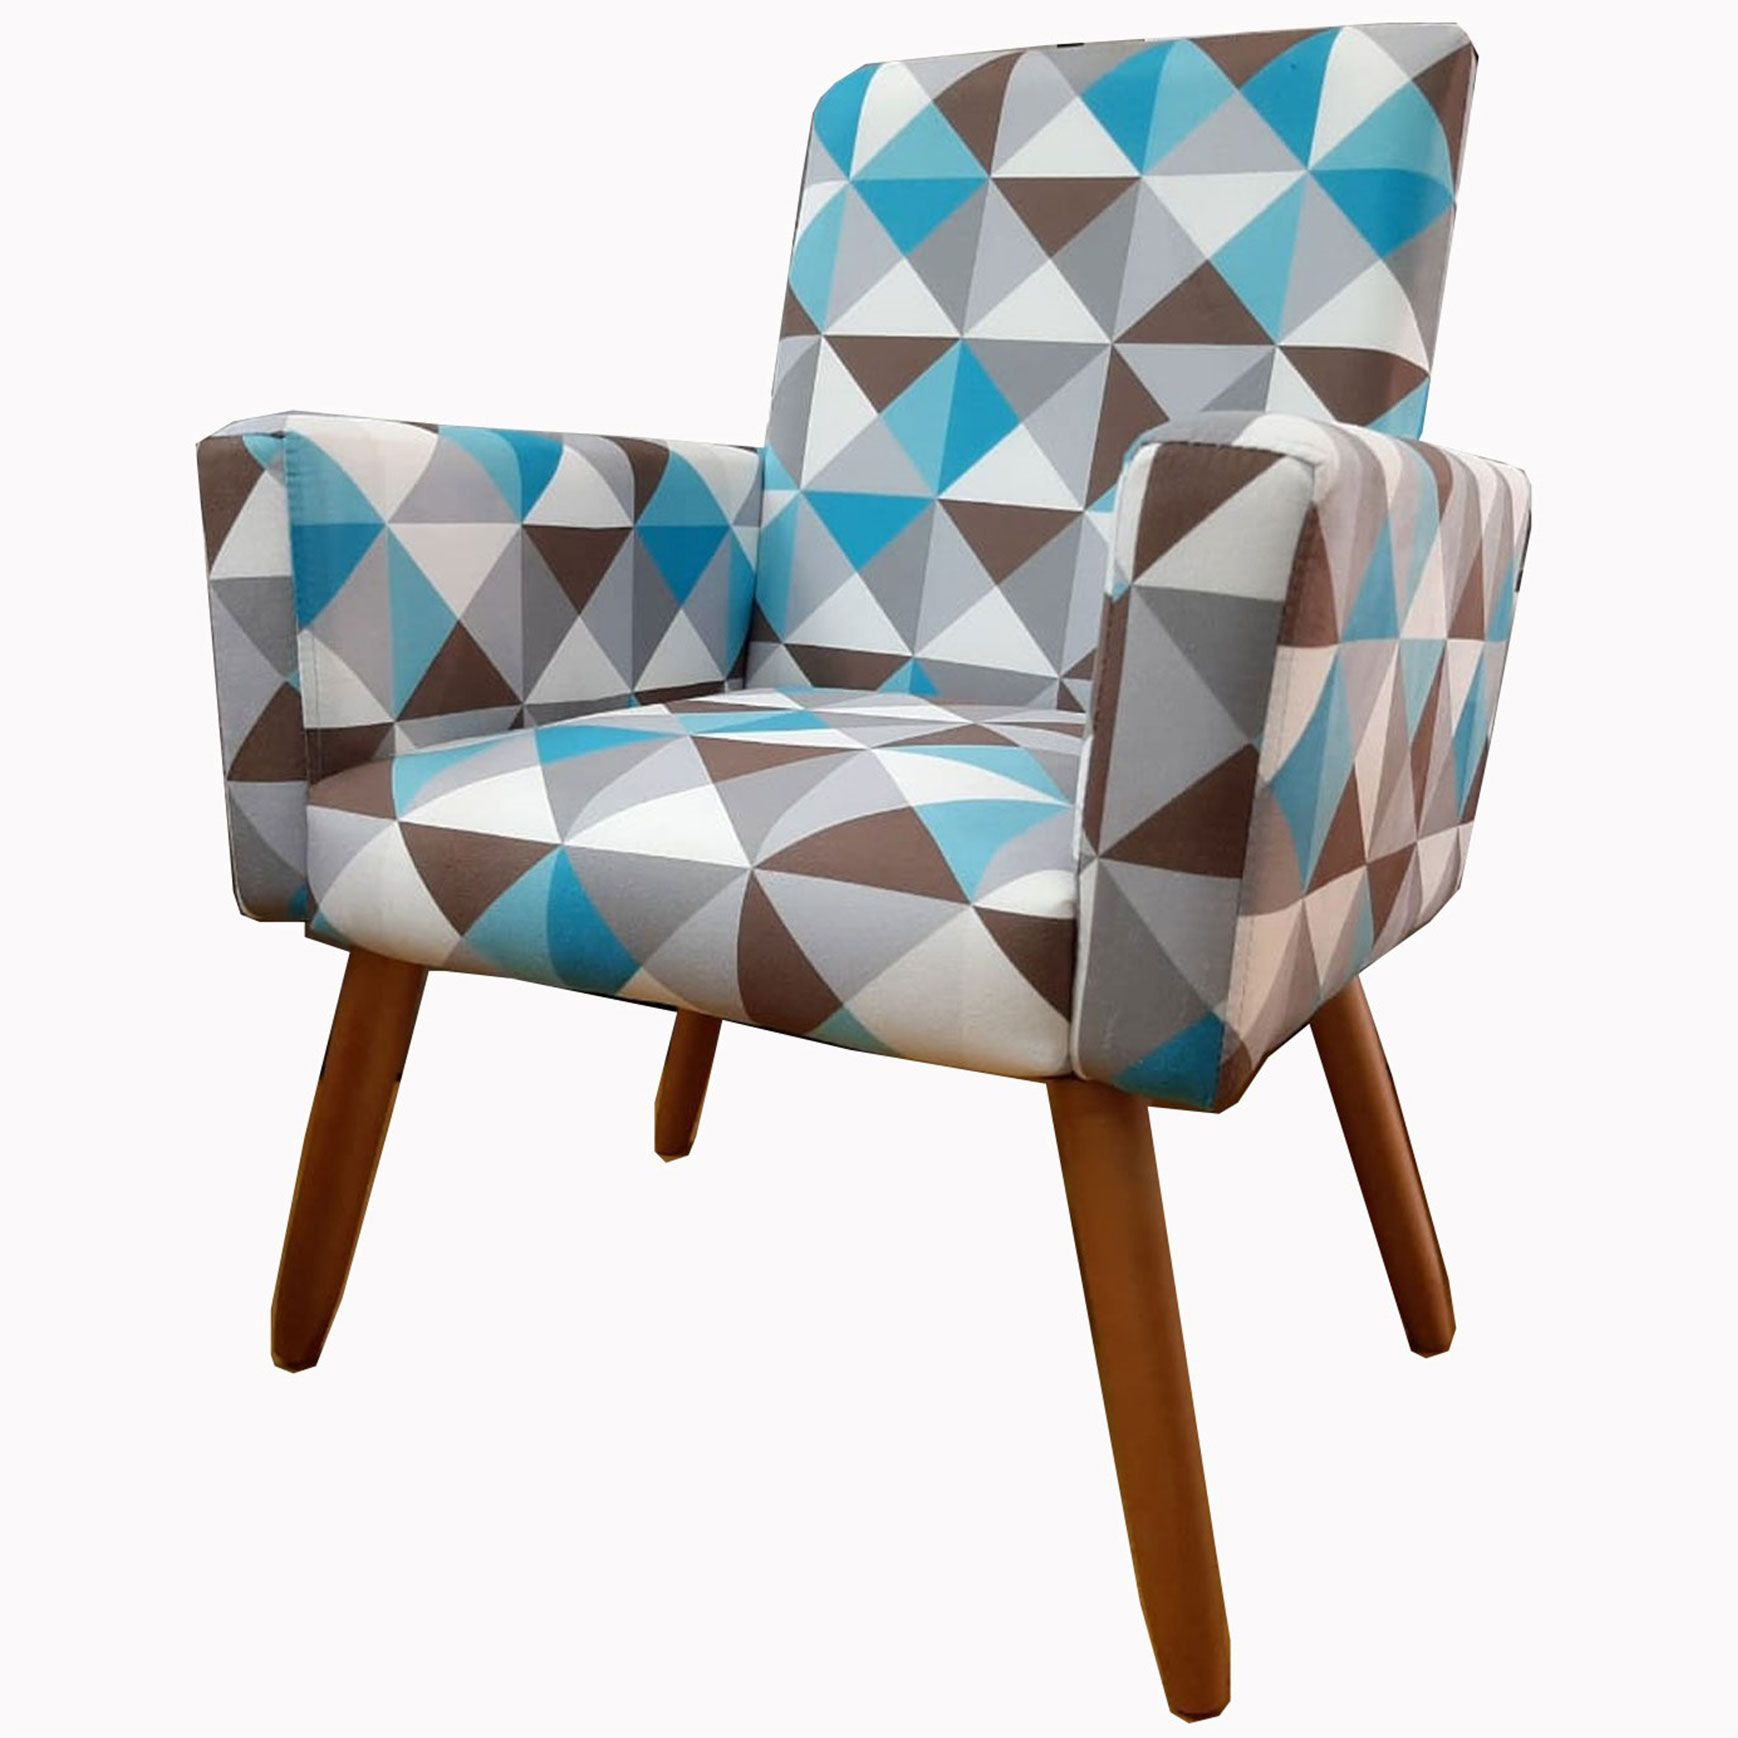 Poltrona Decorativa Nina Pé Palito Estampa Triângulo Azul